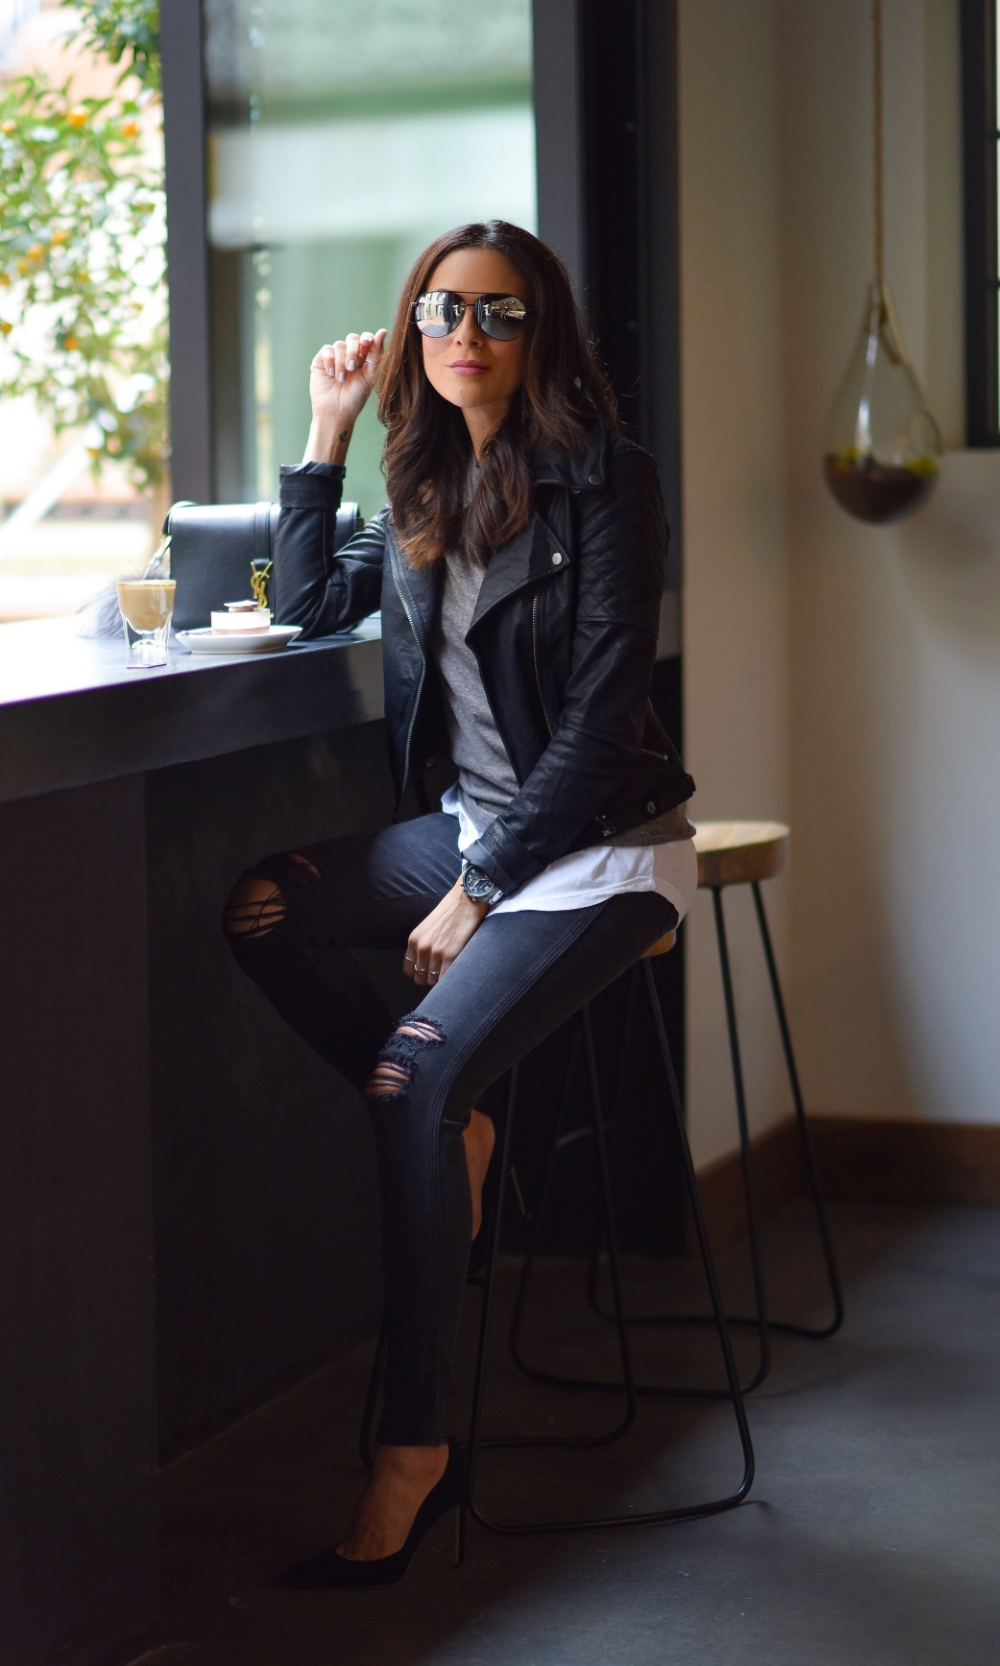 TularosaLabel_MaxiDress_LaPlazaLajolla_AzzurraCapri_LucysWhims_FashionBlogger_ElixirEspressoBar.jpg